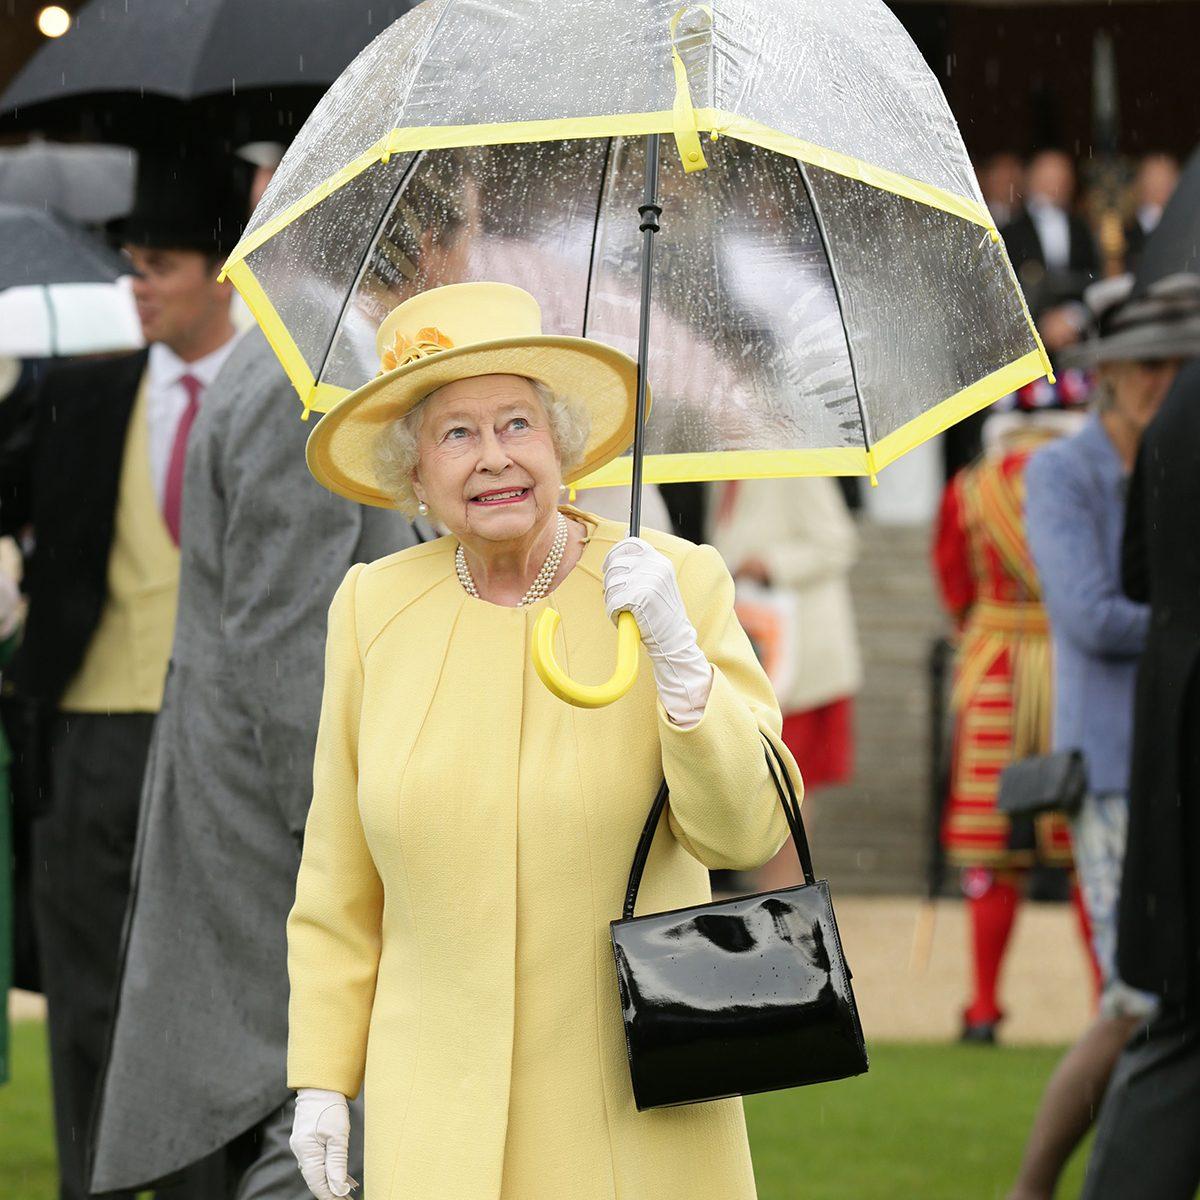 Queen Elizabeth II Garden Party at Buckingham Palace, London, Britain